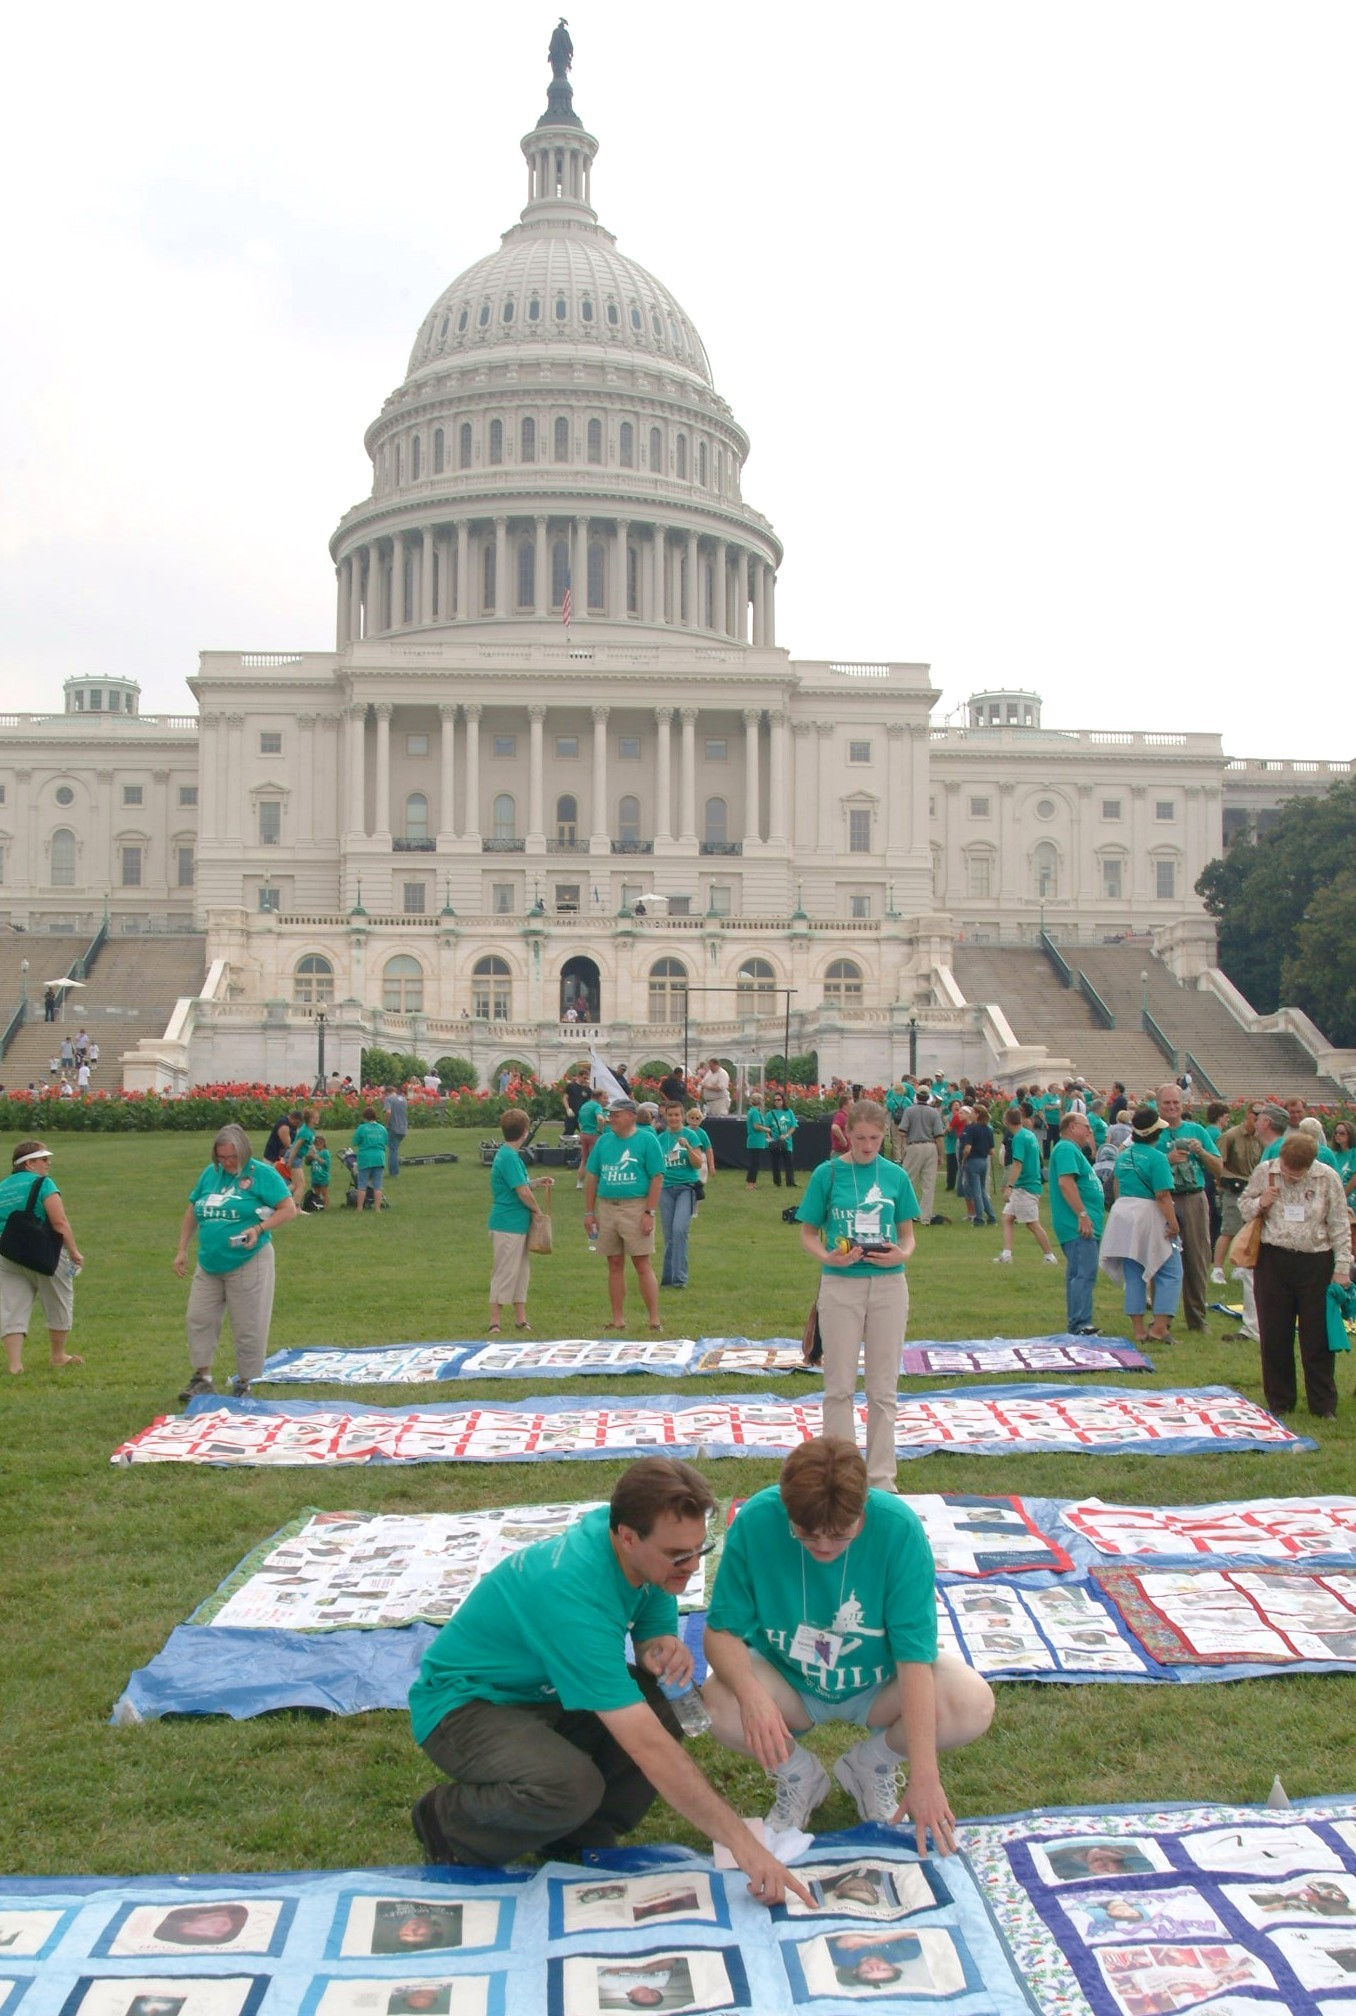 FJC-Sandy Martin - Capitol - 2005